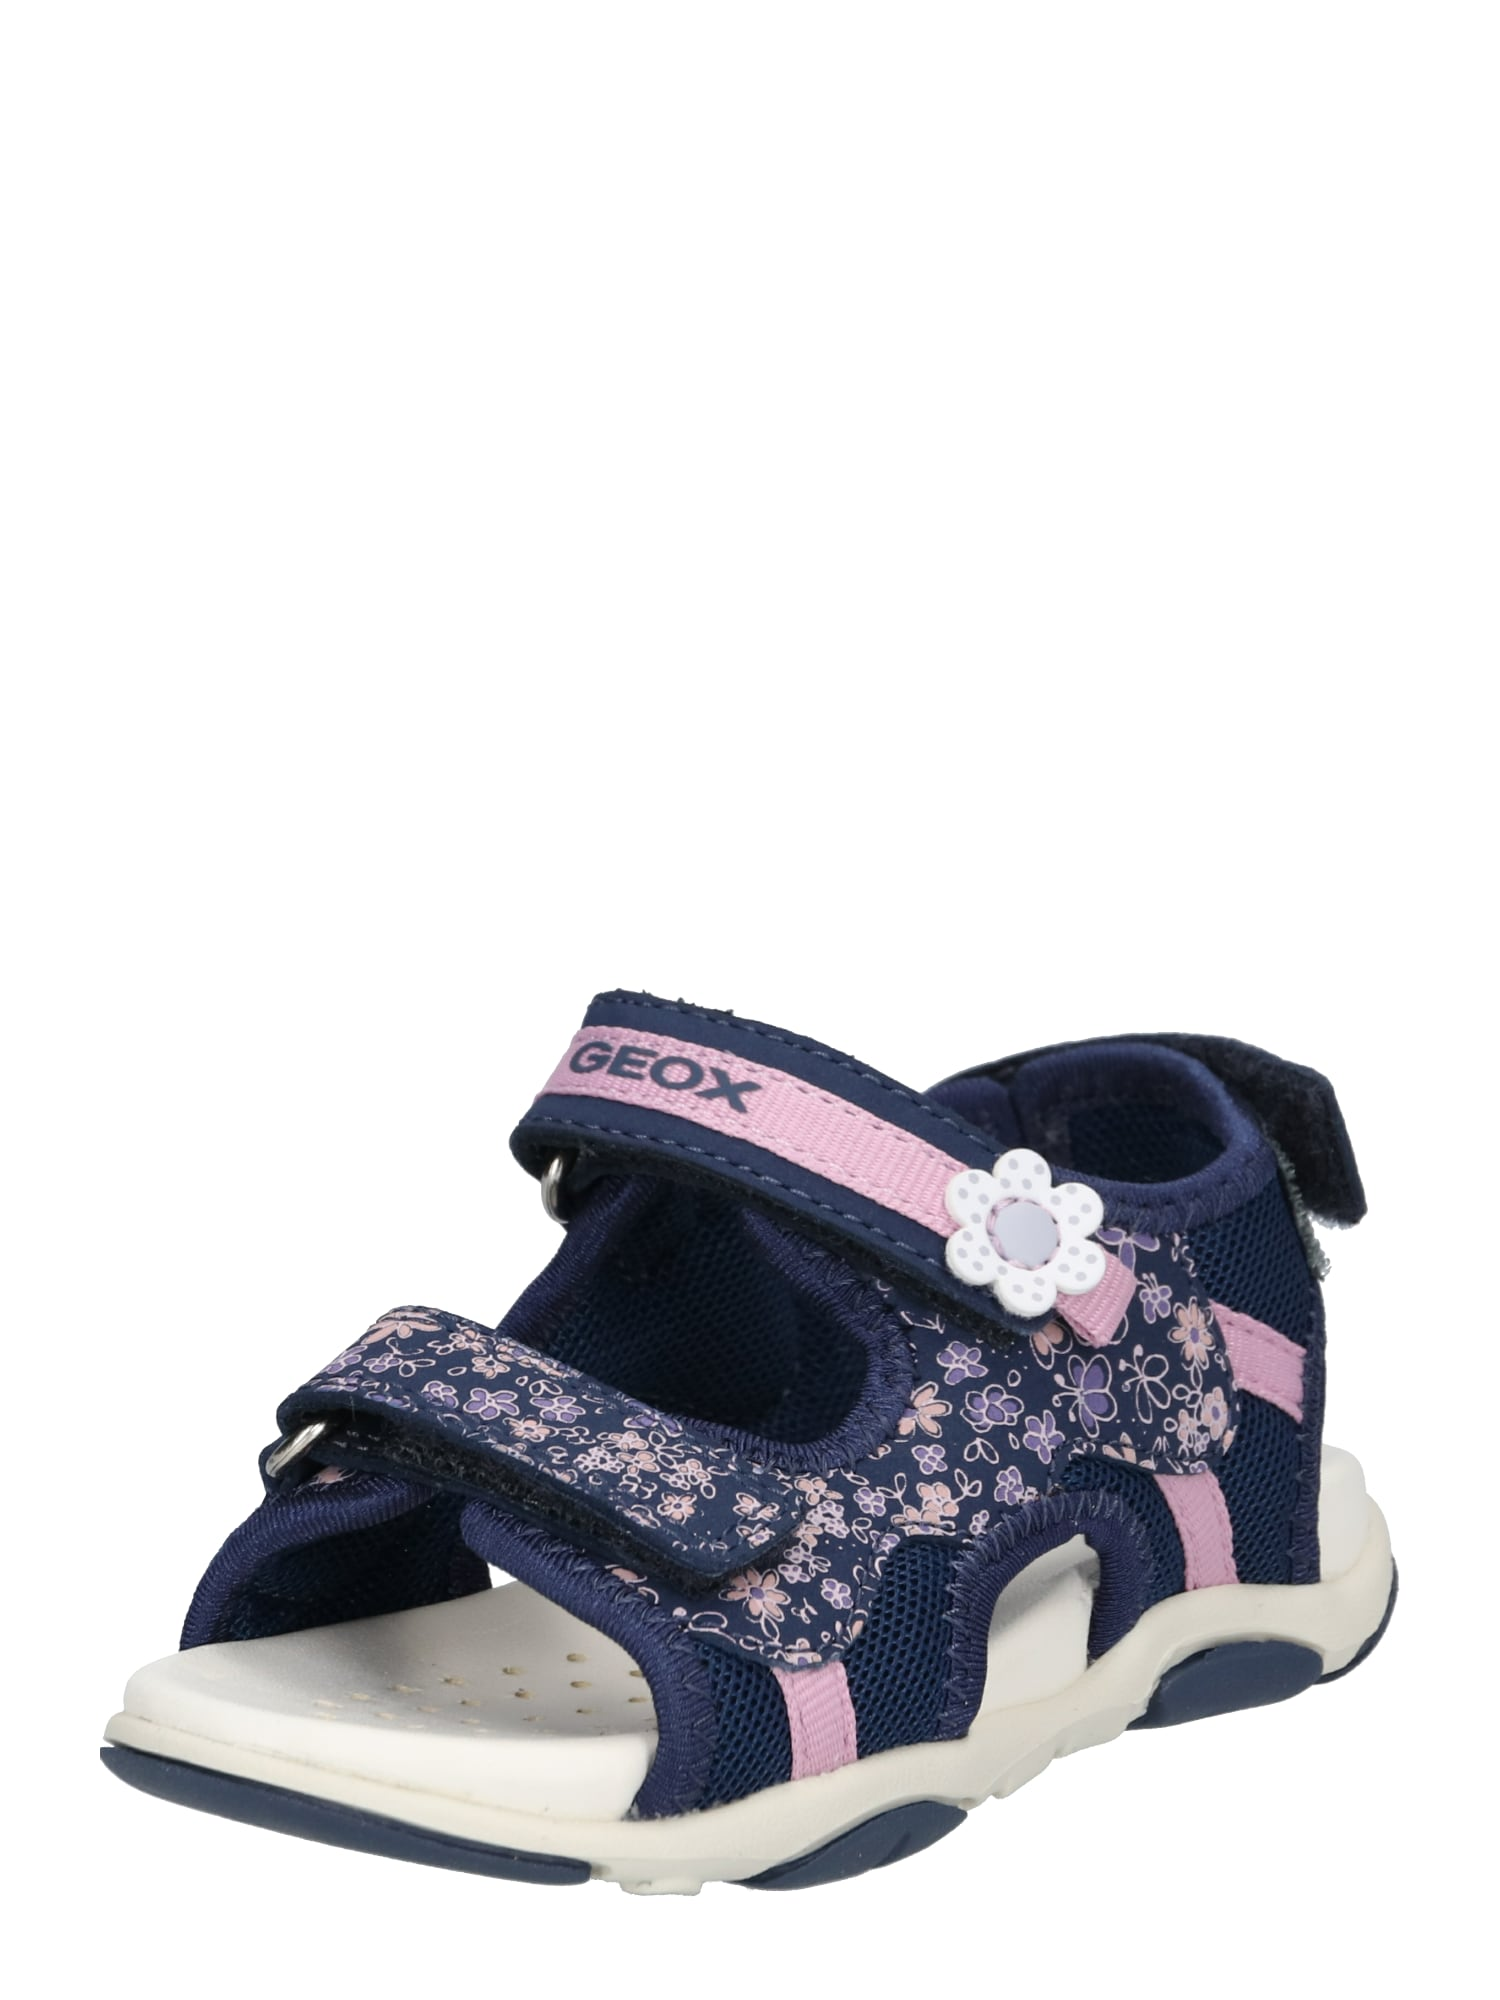 Sandály Agasim námořnická modř růžová GEOX